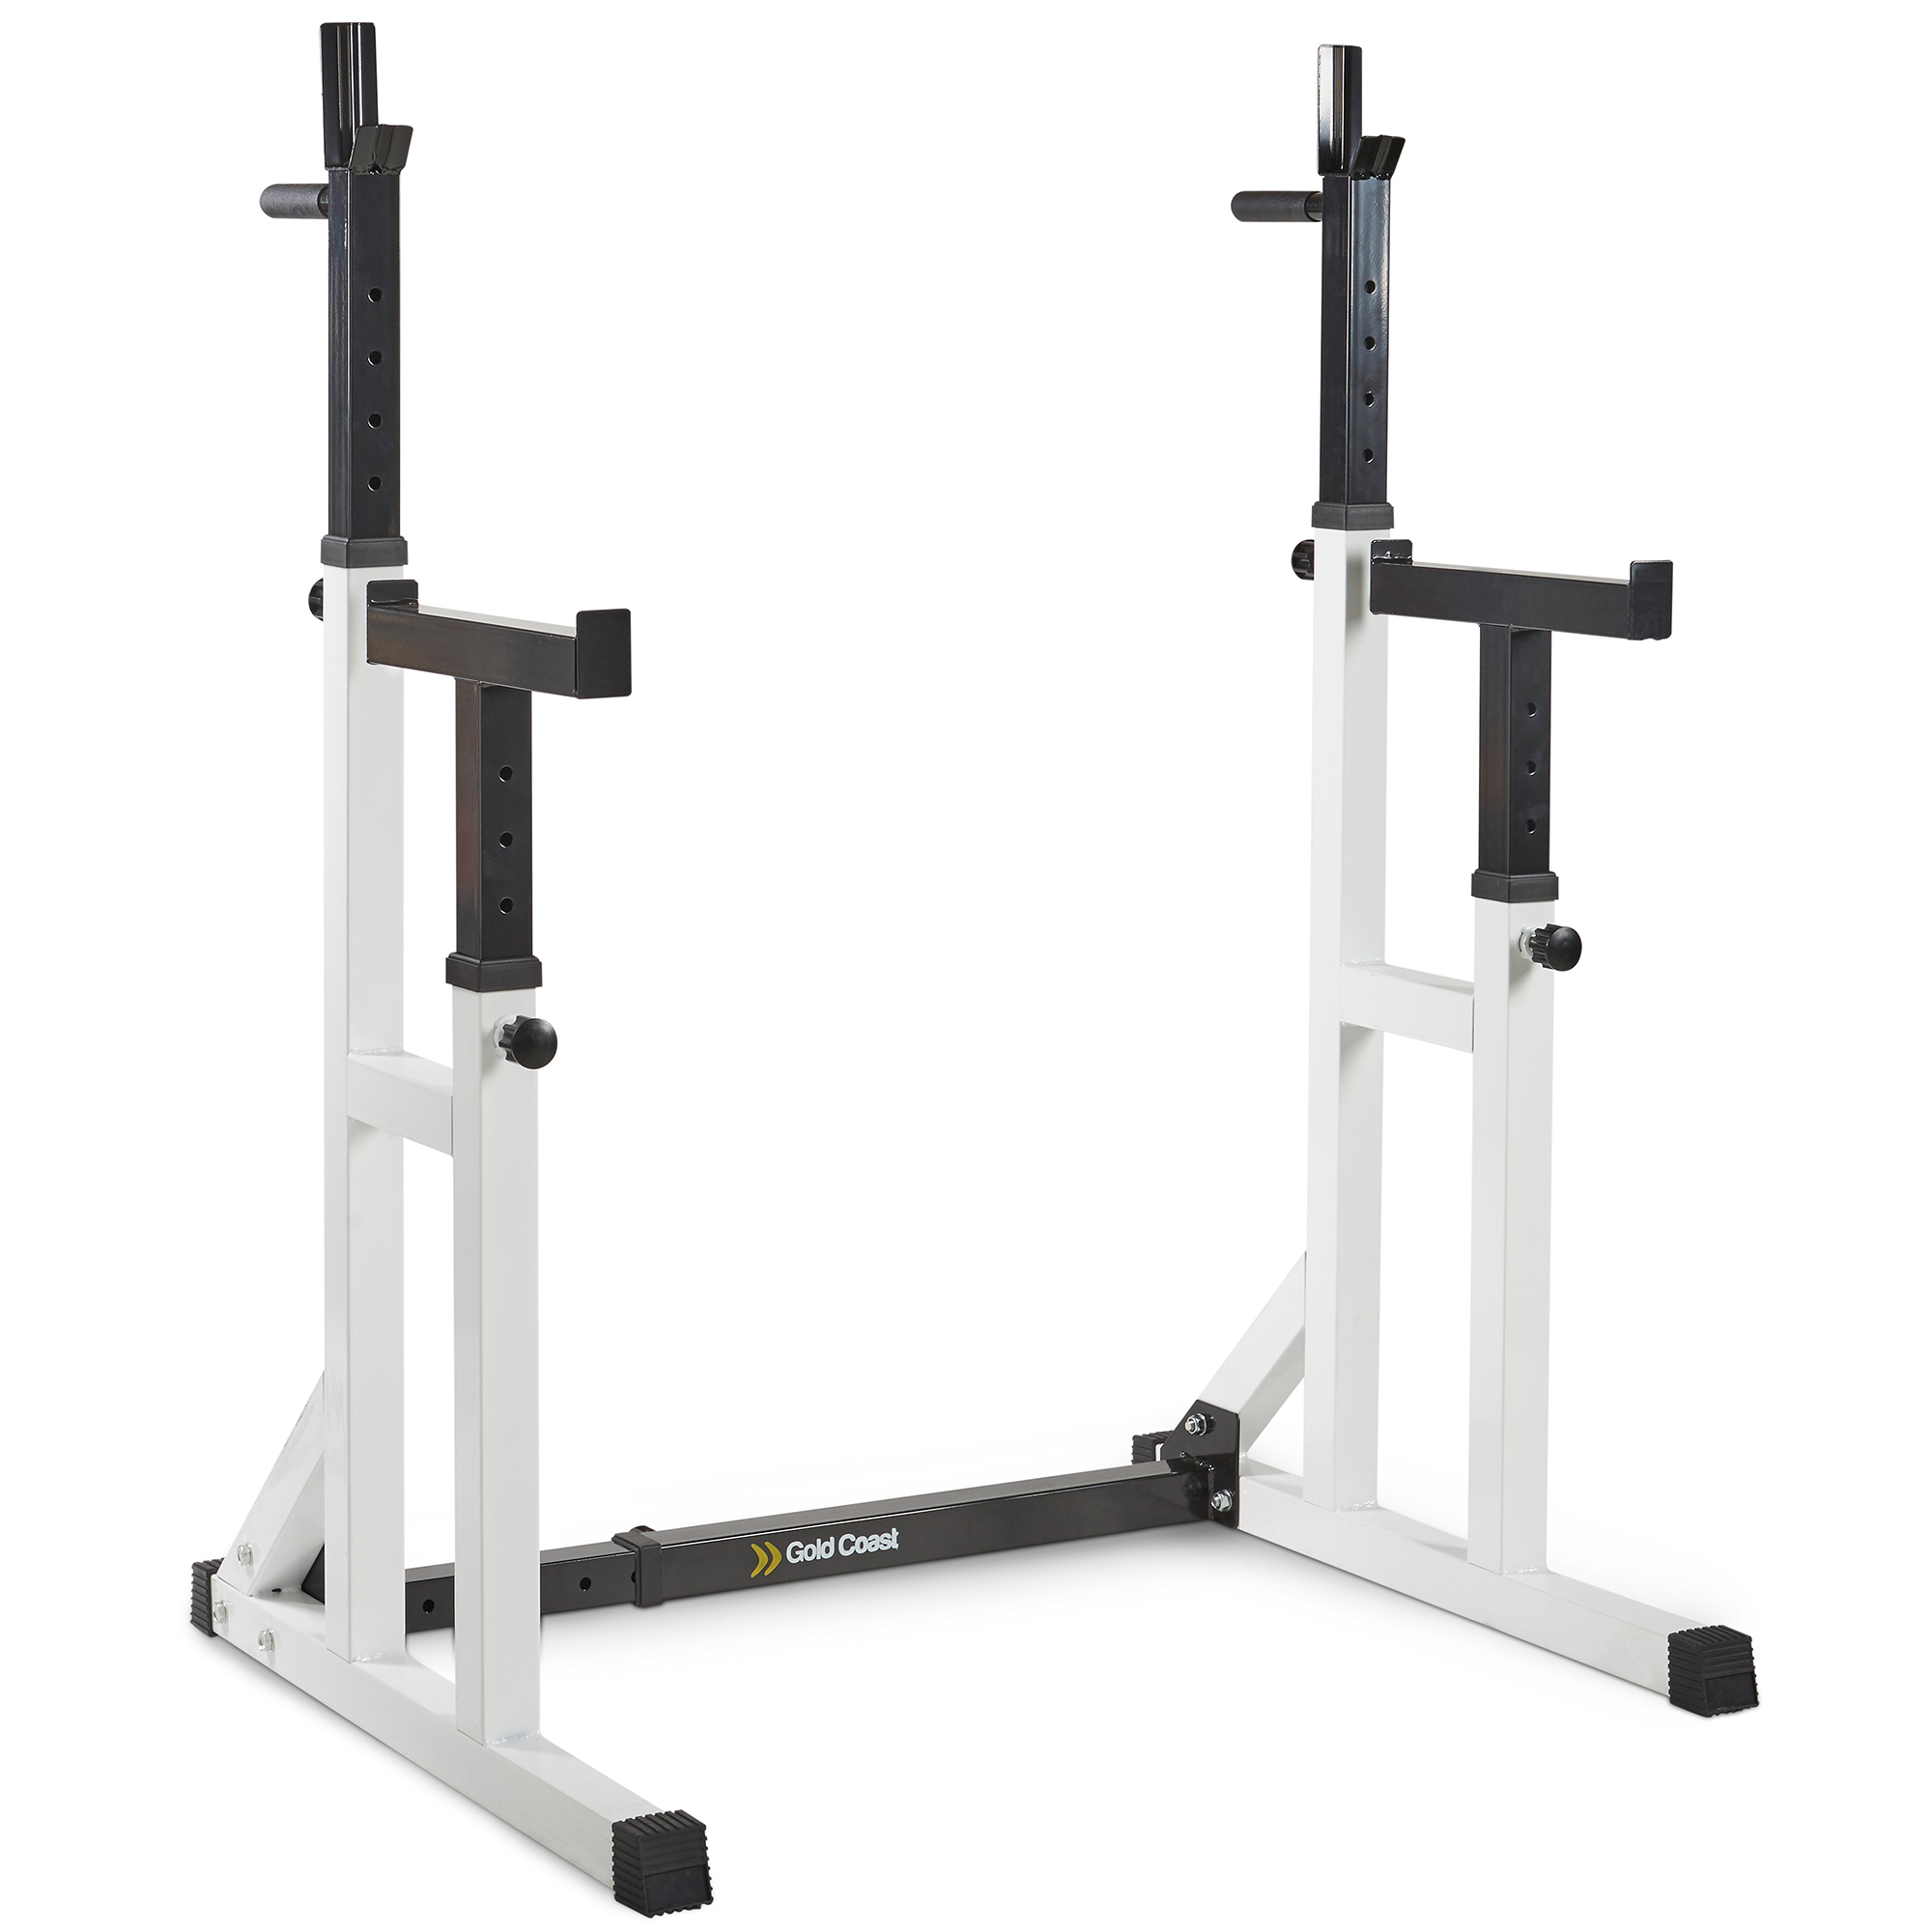 Gym Equipment Gold Coast: Gold Coast Adjustable Squat Rack/Dip Stand/Gym Weight